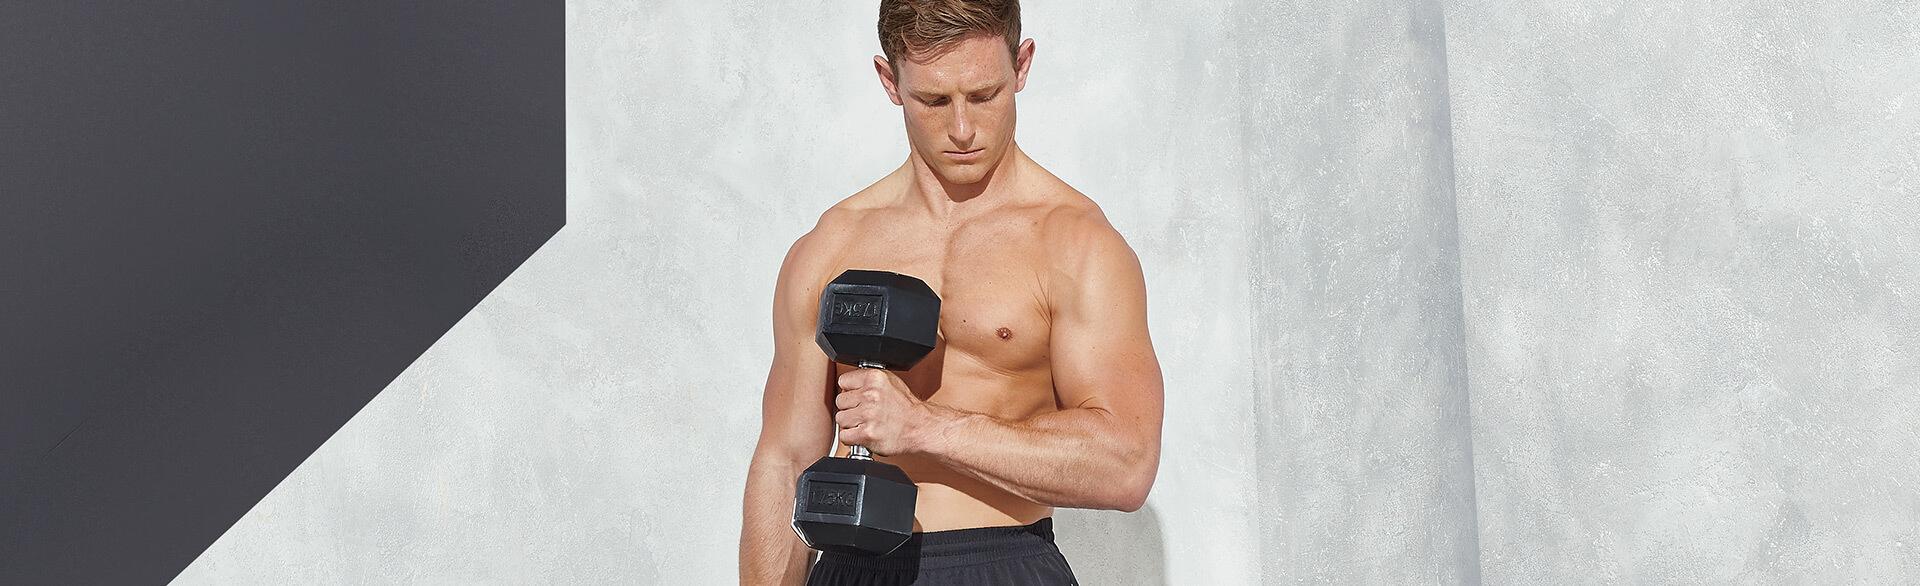 Какая ваша фитнес цель?